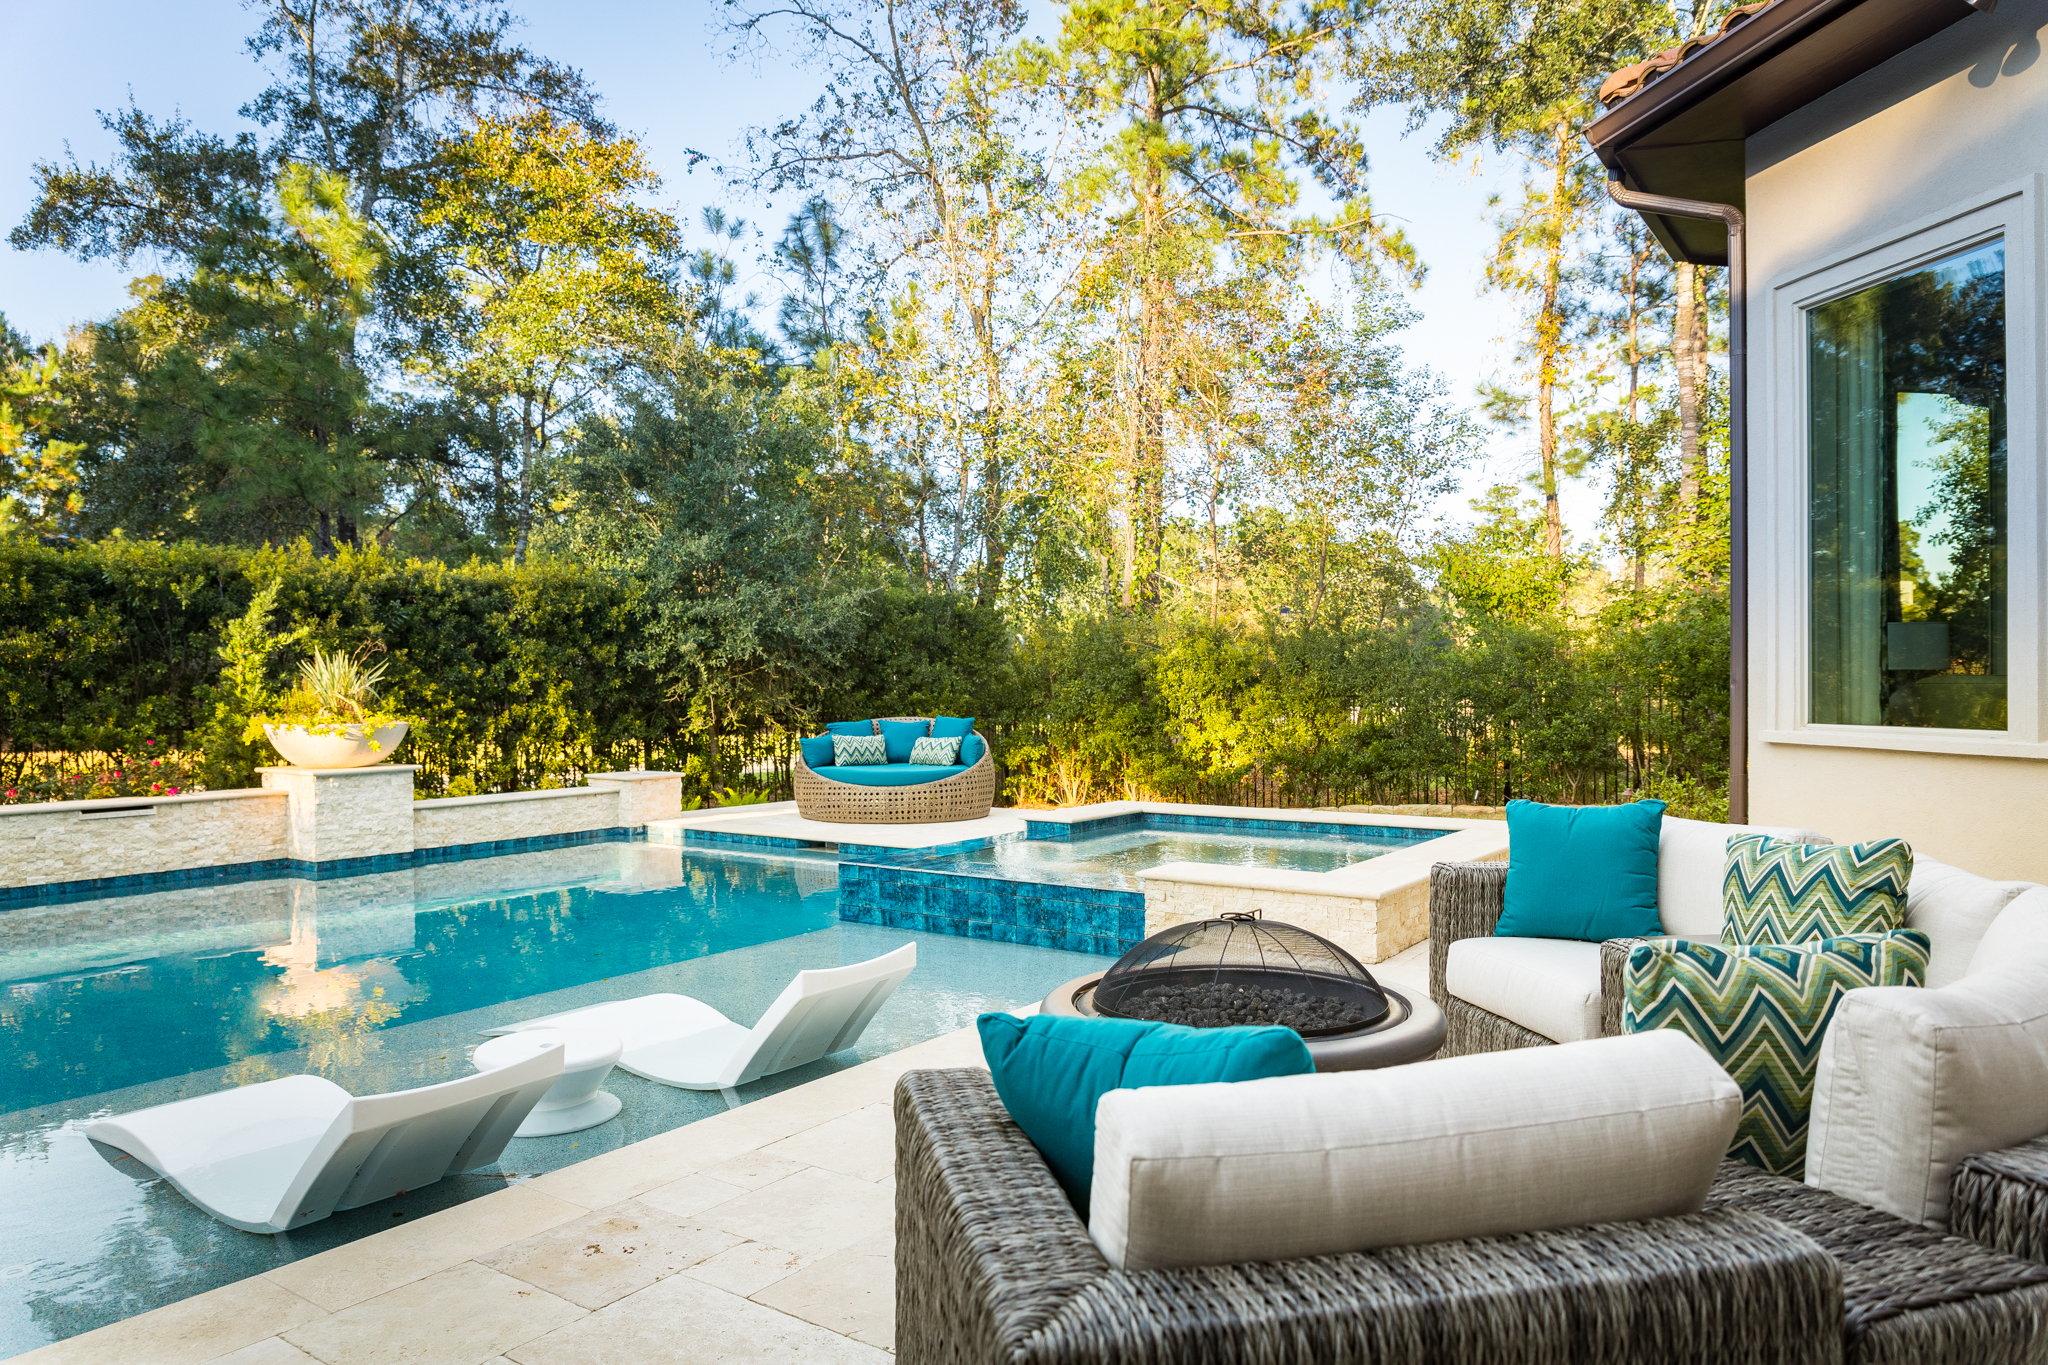 Project Reveal - Family room, backyard furnishings, breakfast room | Carla Aston, Designer | Colleen Scott, Photographer | #pool #backyard #patio #backyardoasis